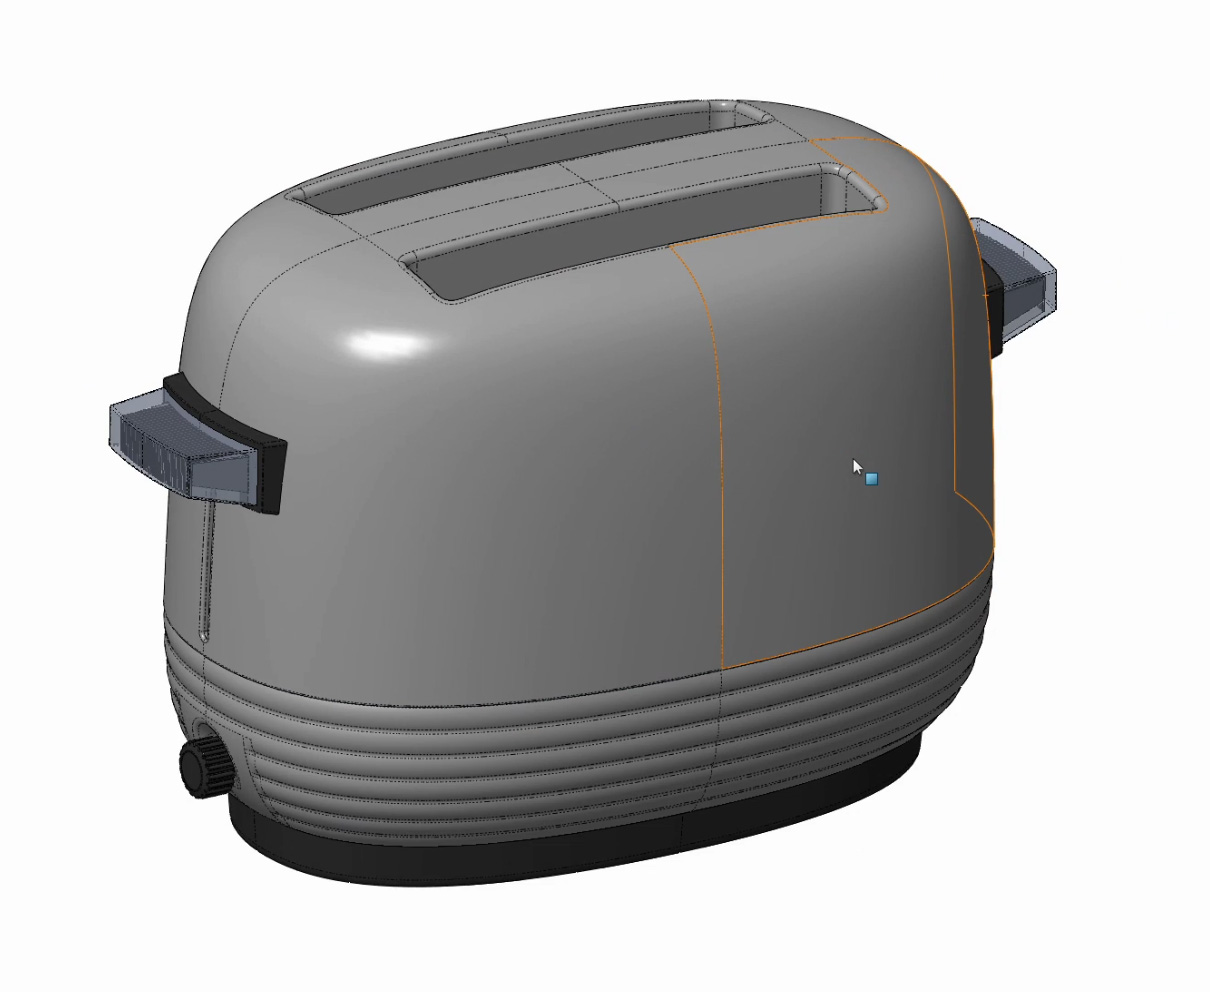 Solidworks: Modelling a Proctor Model 1481 Toaster